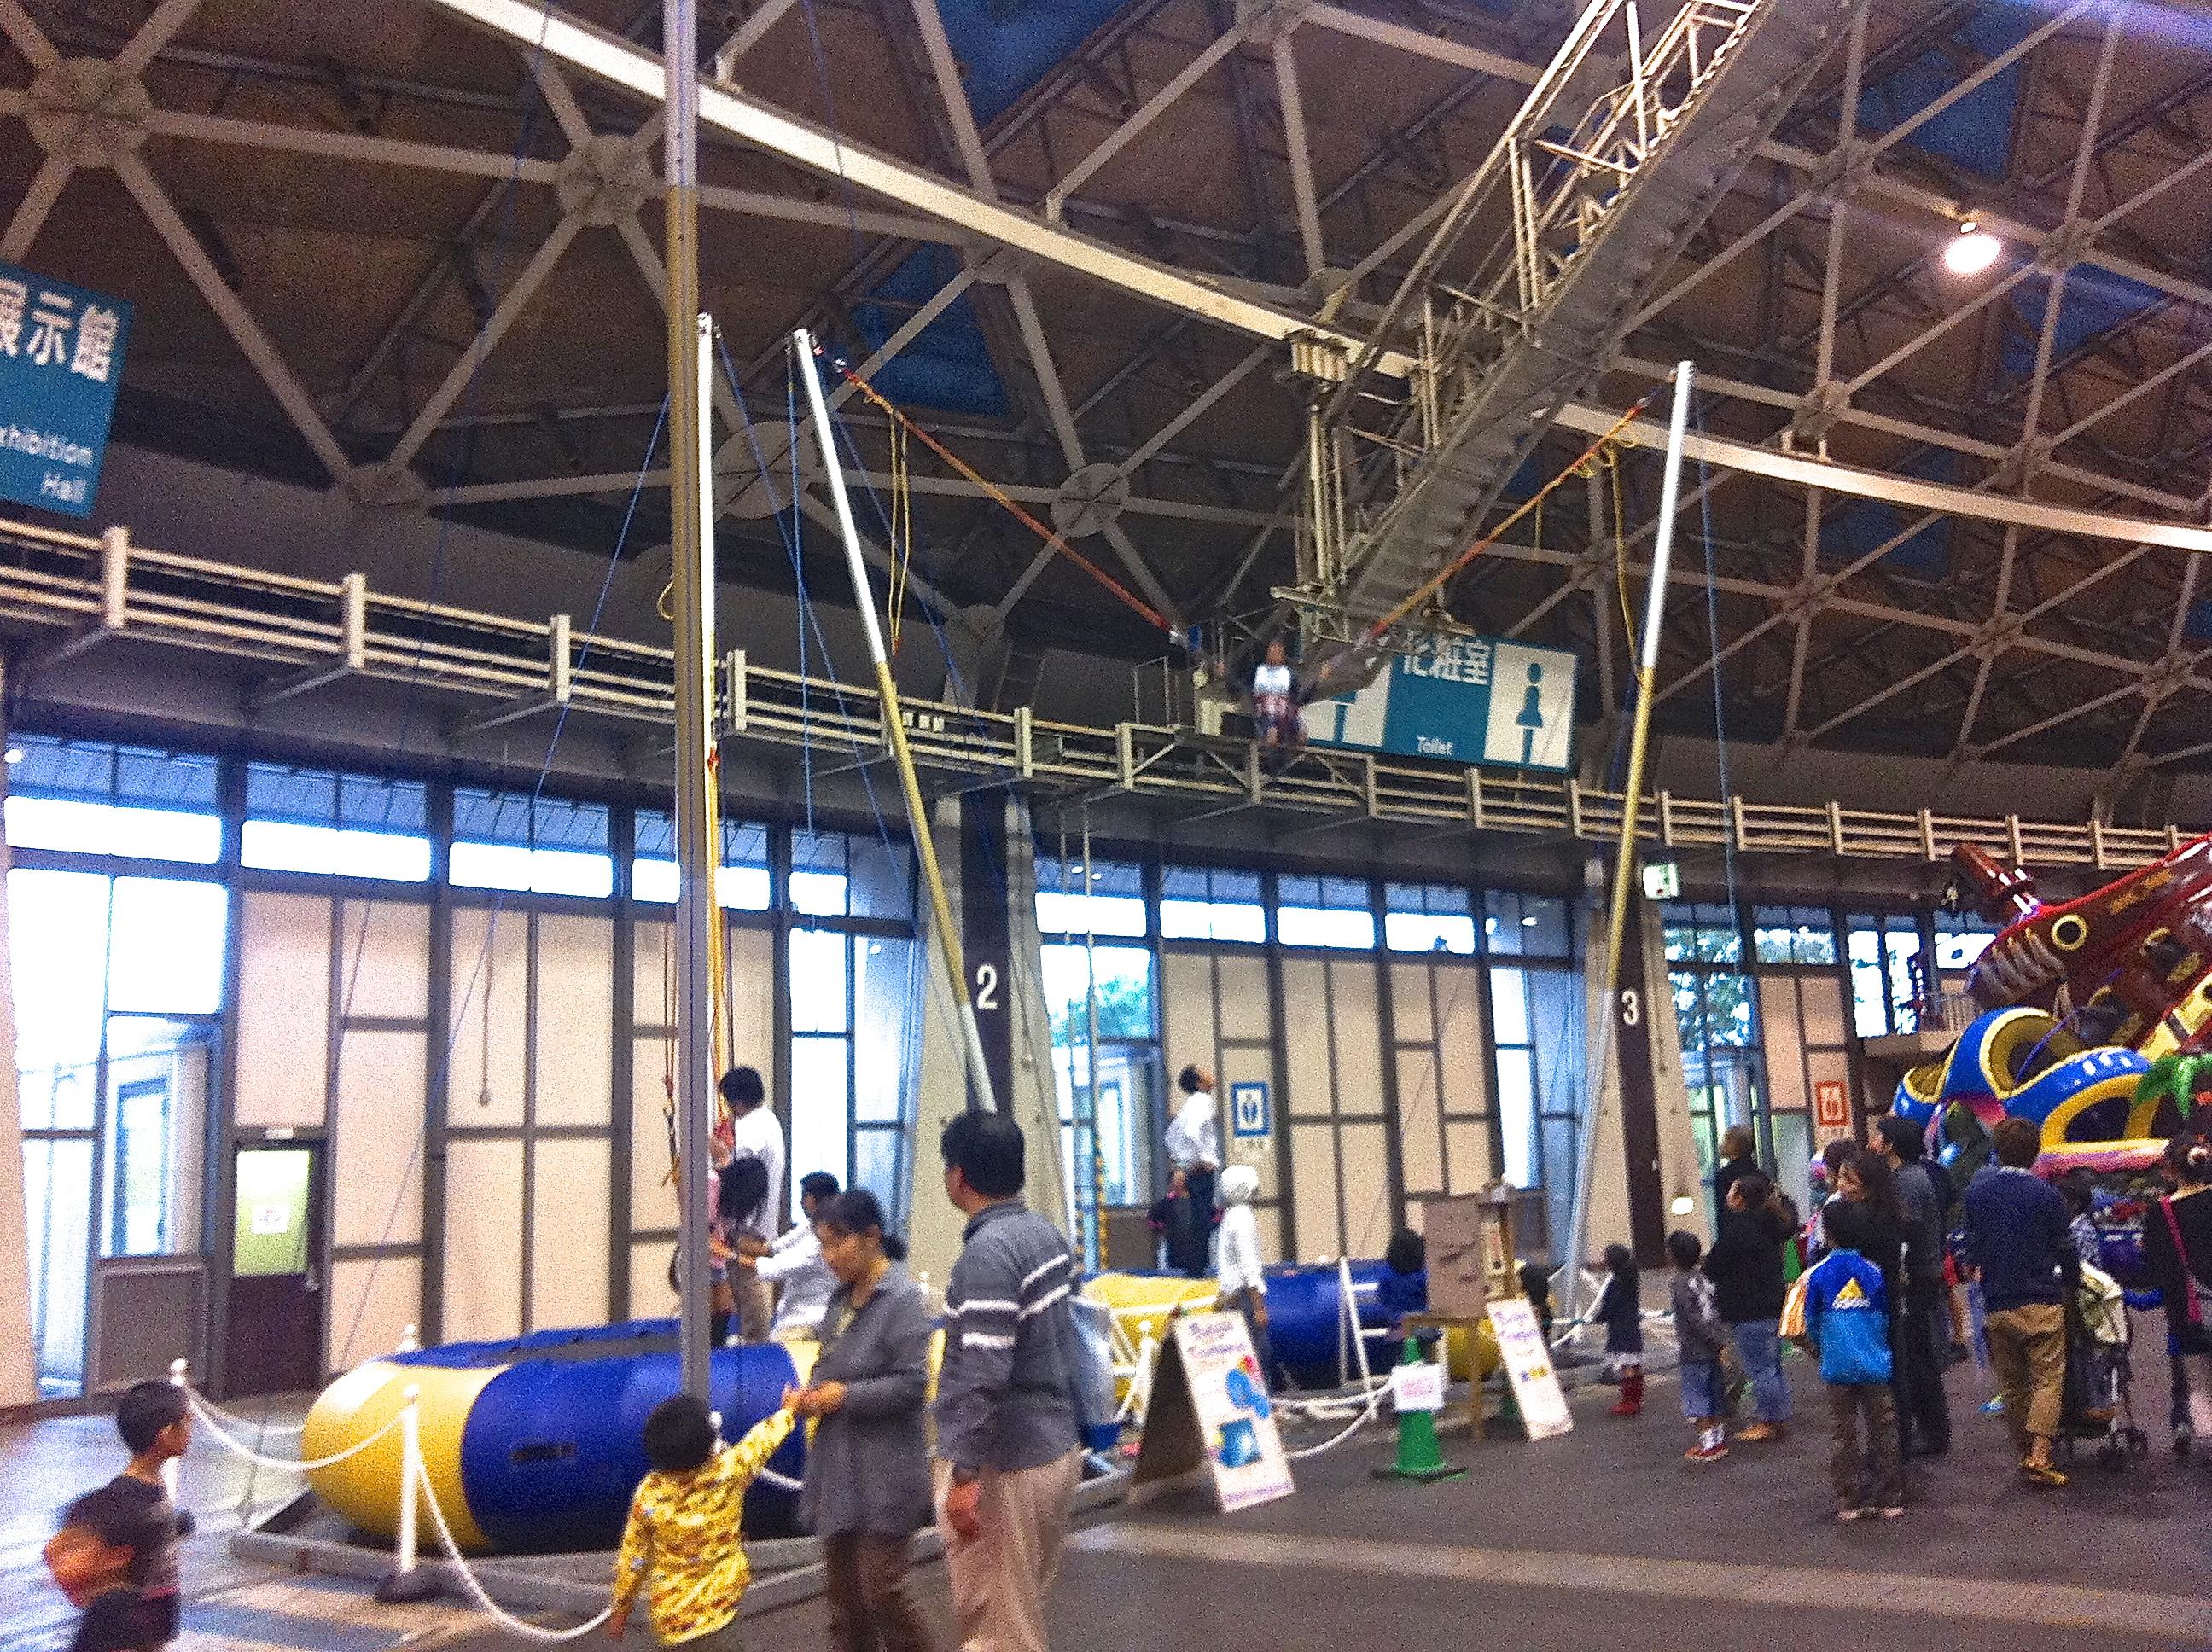 http://www.vantech.jp/shops/info/IMG_0483.JPG